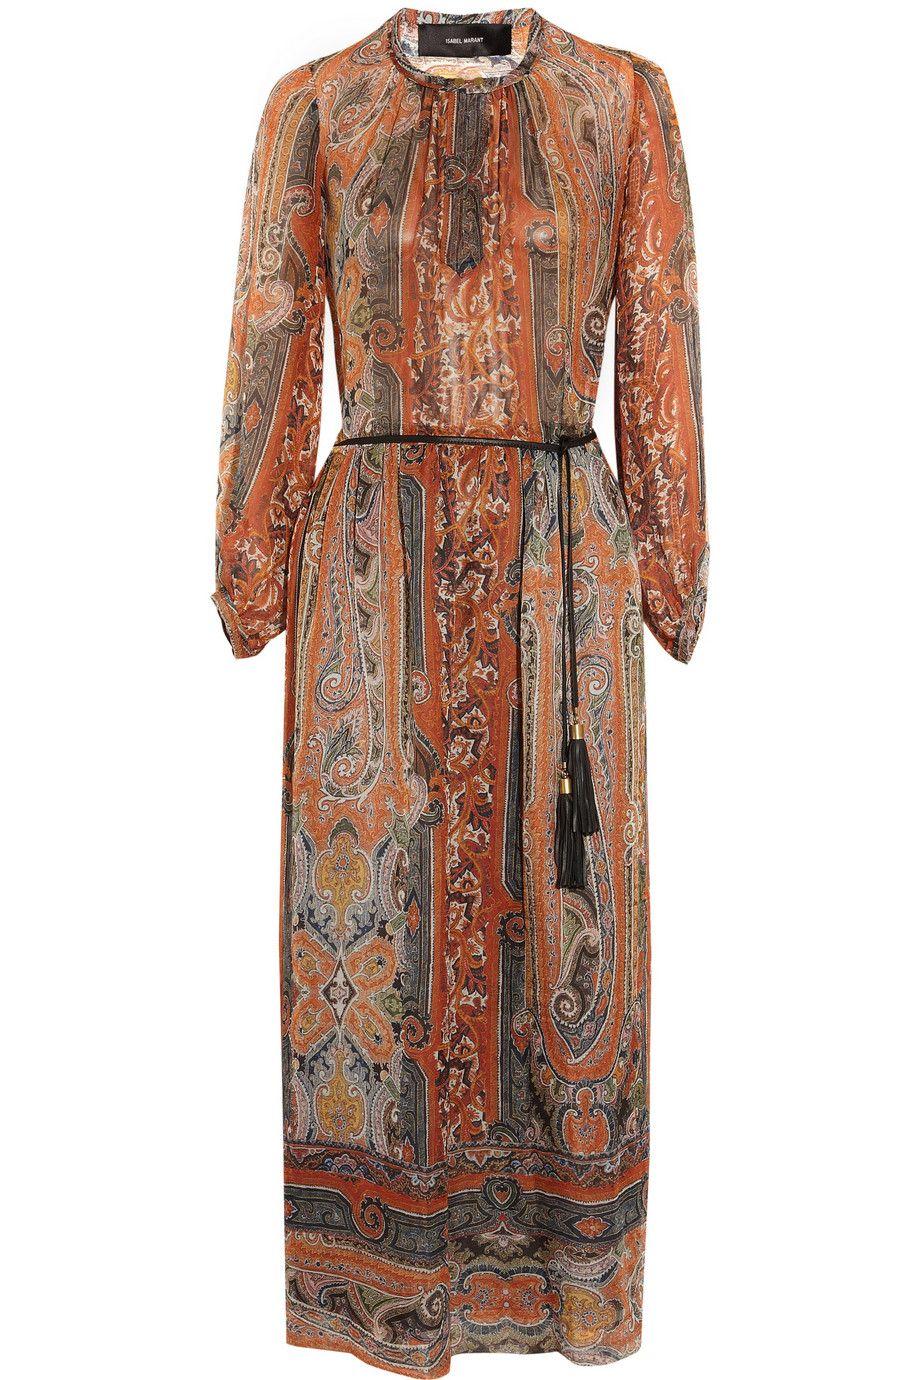 Brick Samuel Printed Silk Gauze Midi Dress Isabel Marant Clothes Design Dresses Gauze Maxi Dress [ 1380 x 920 Pixel ]